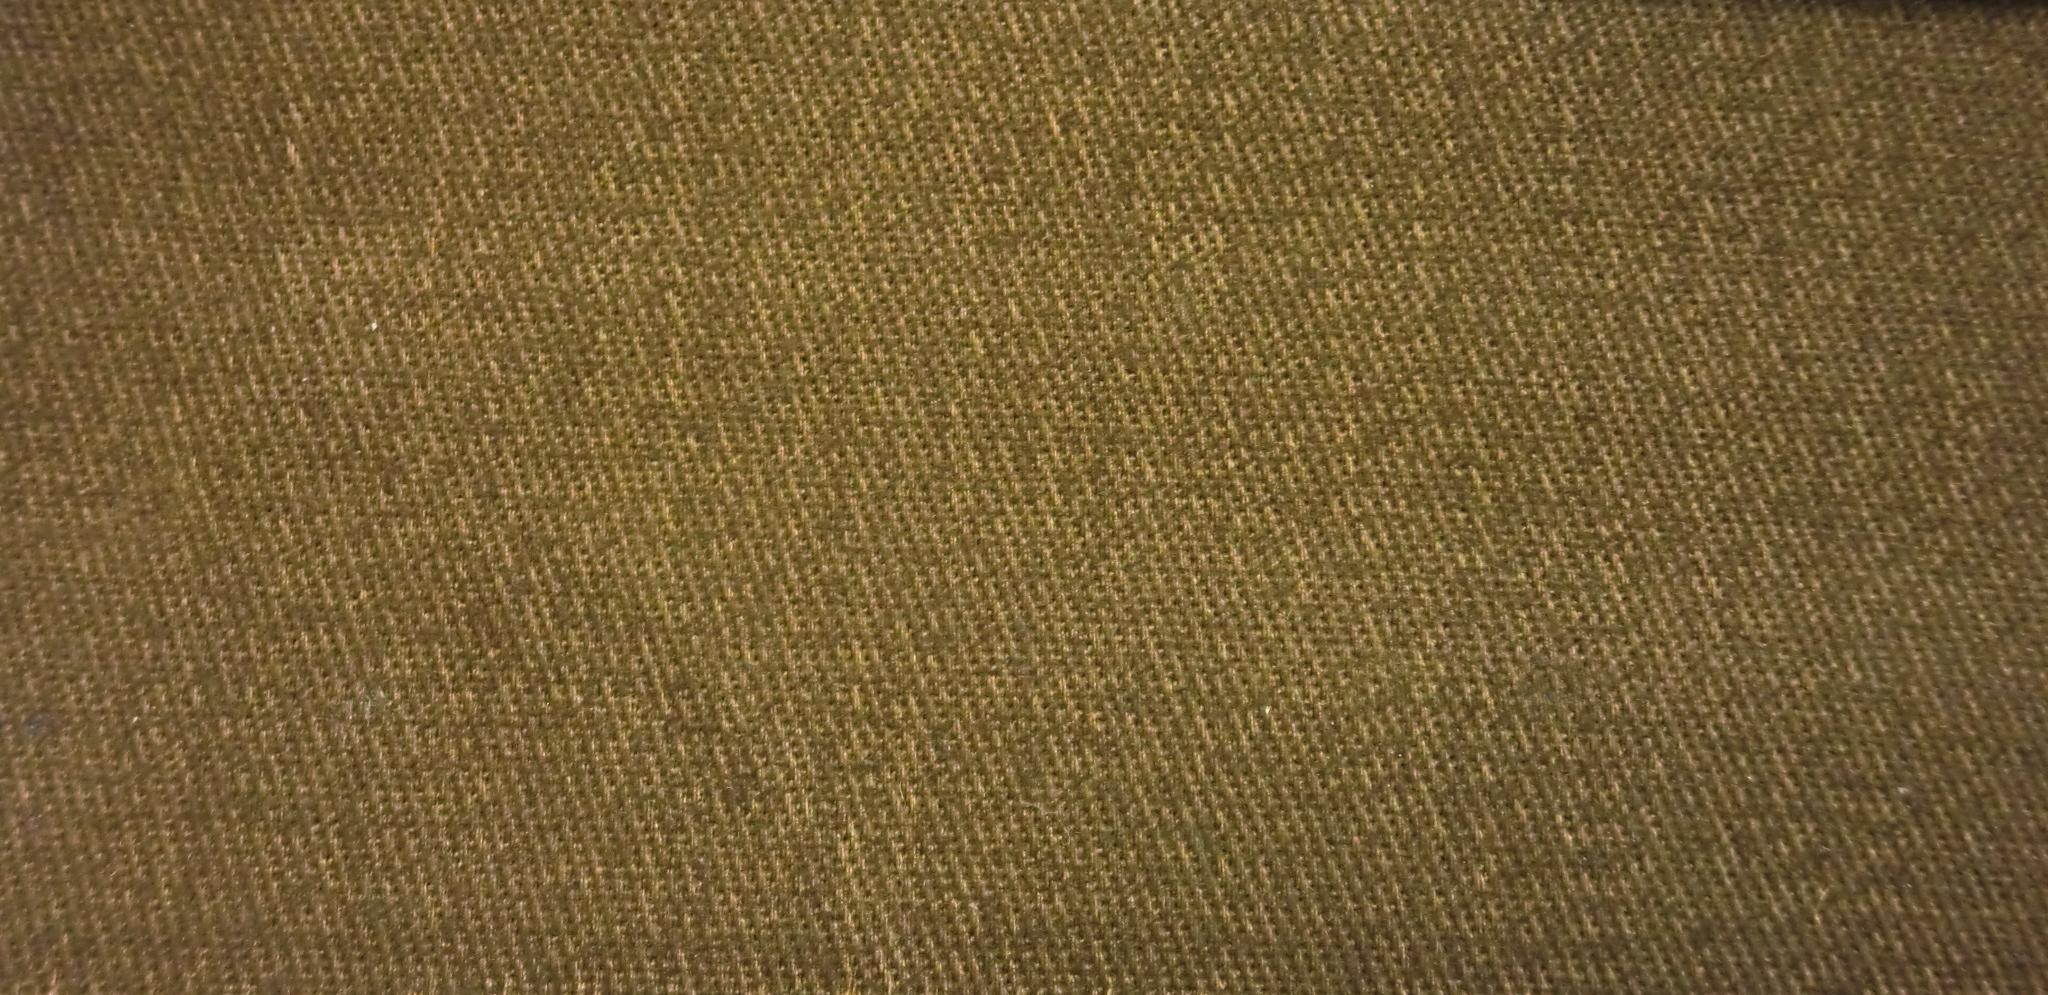 James Thompson Fabrics Micro Brush Twill Potting Soil Brown ...